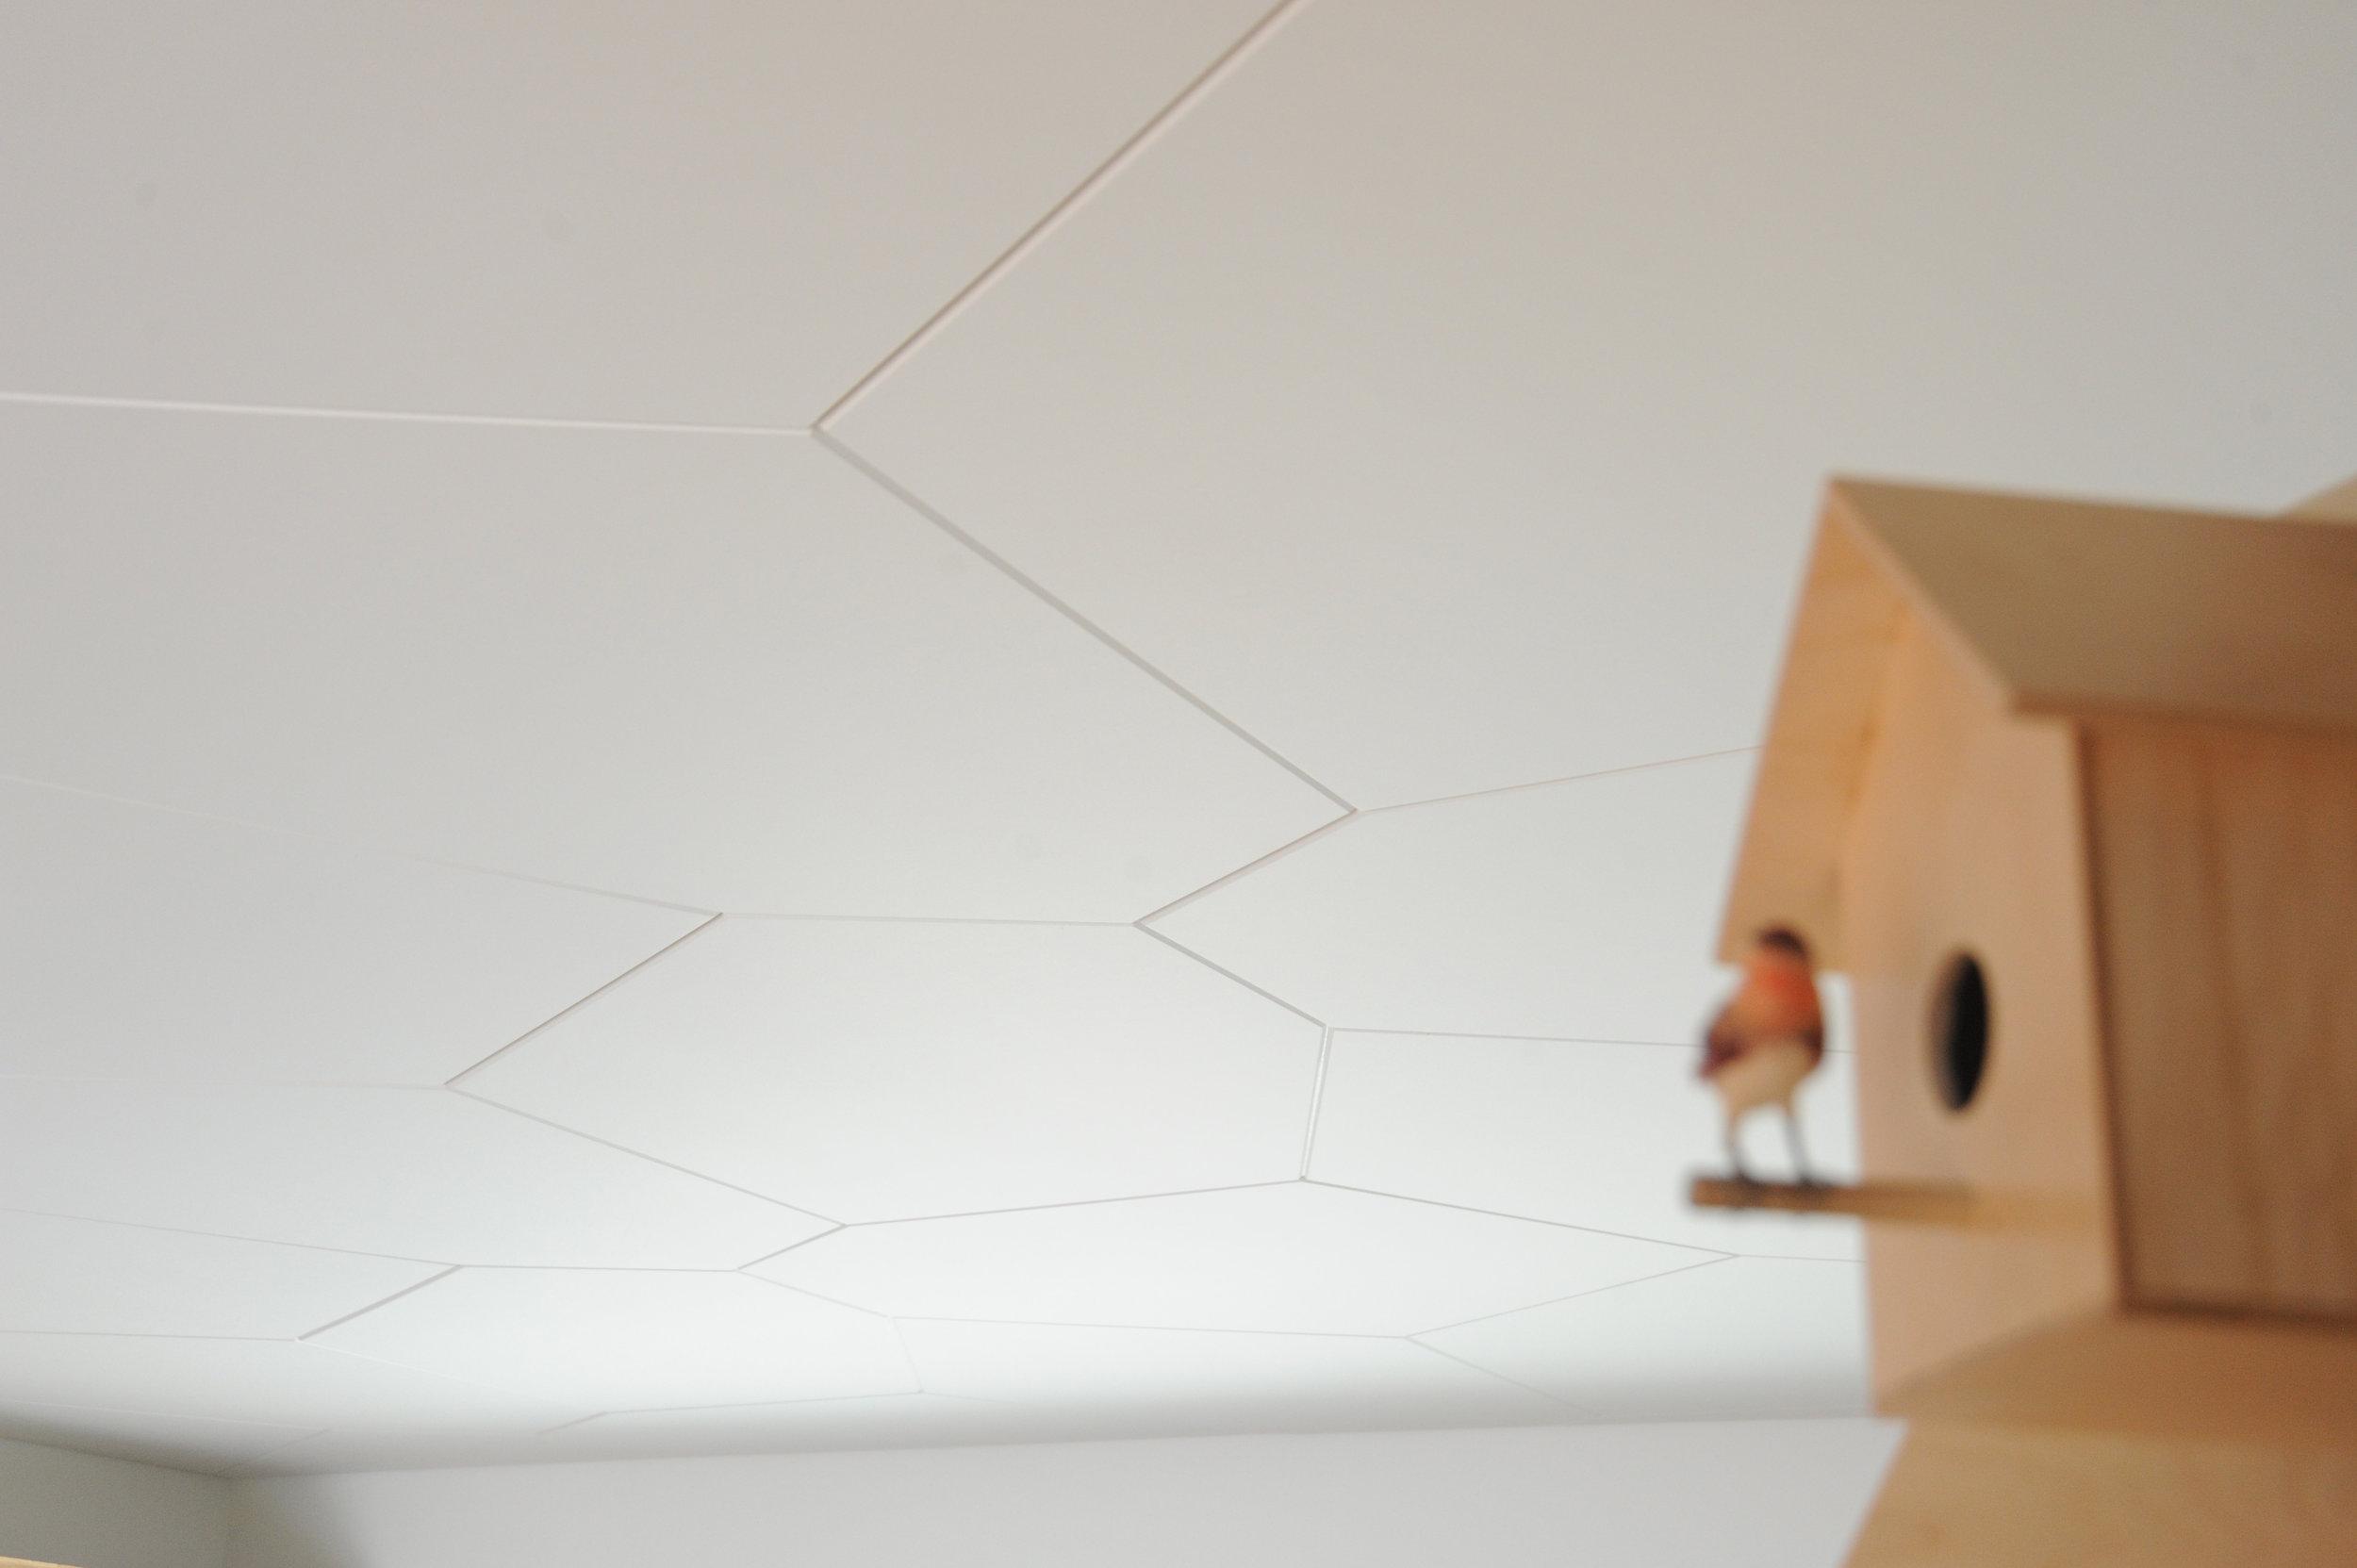 heXagon panels by Nicolas Meyer / Nico Spacecraft